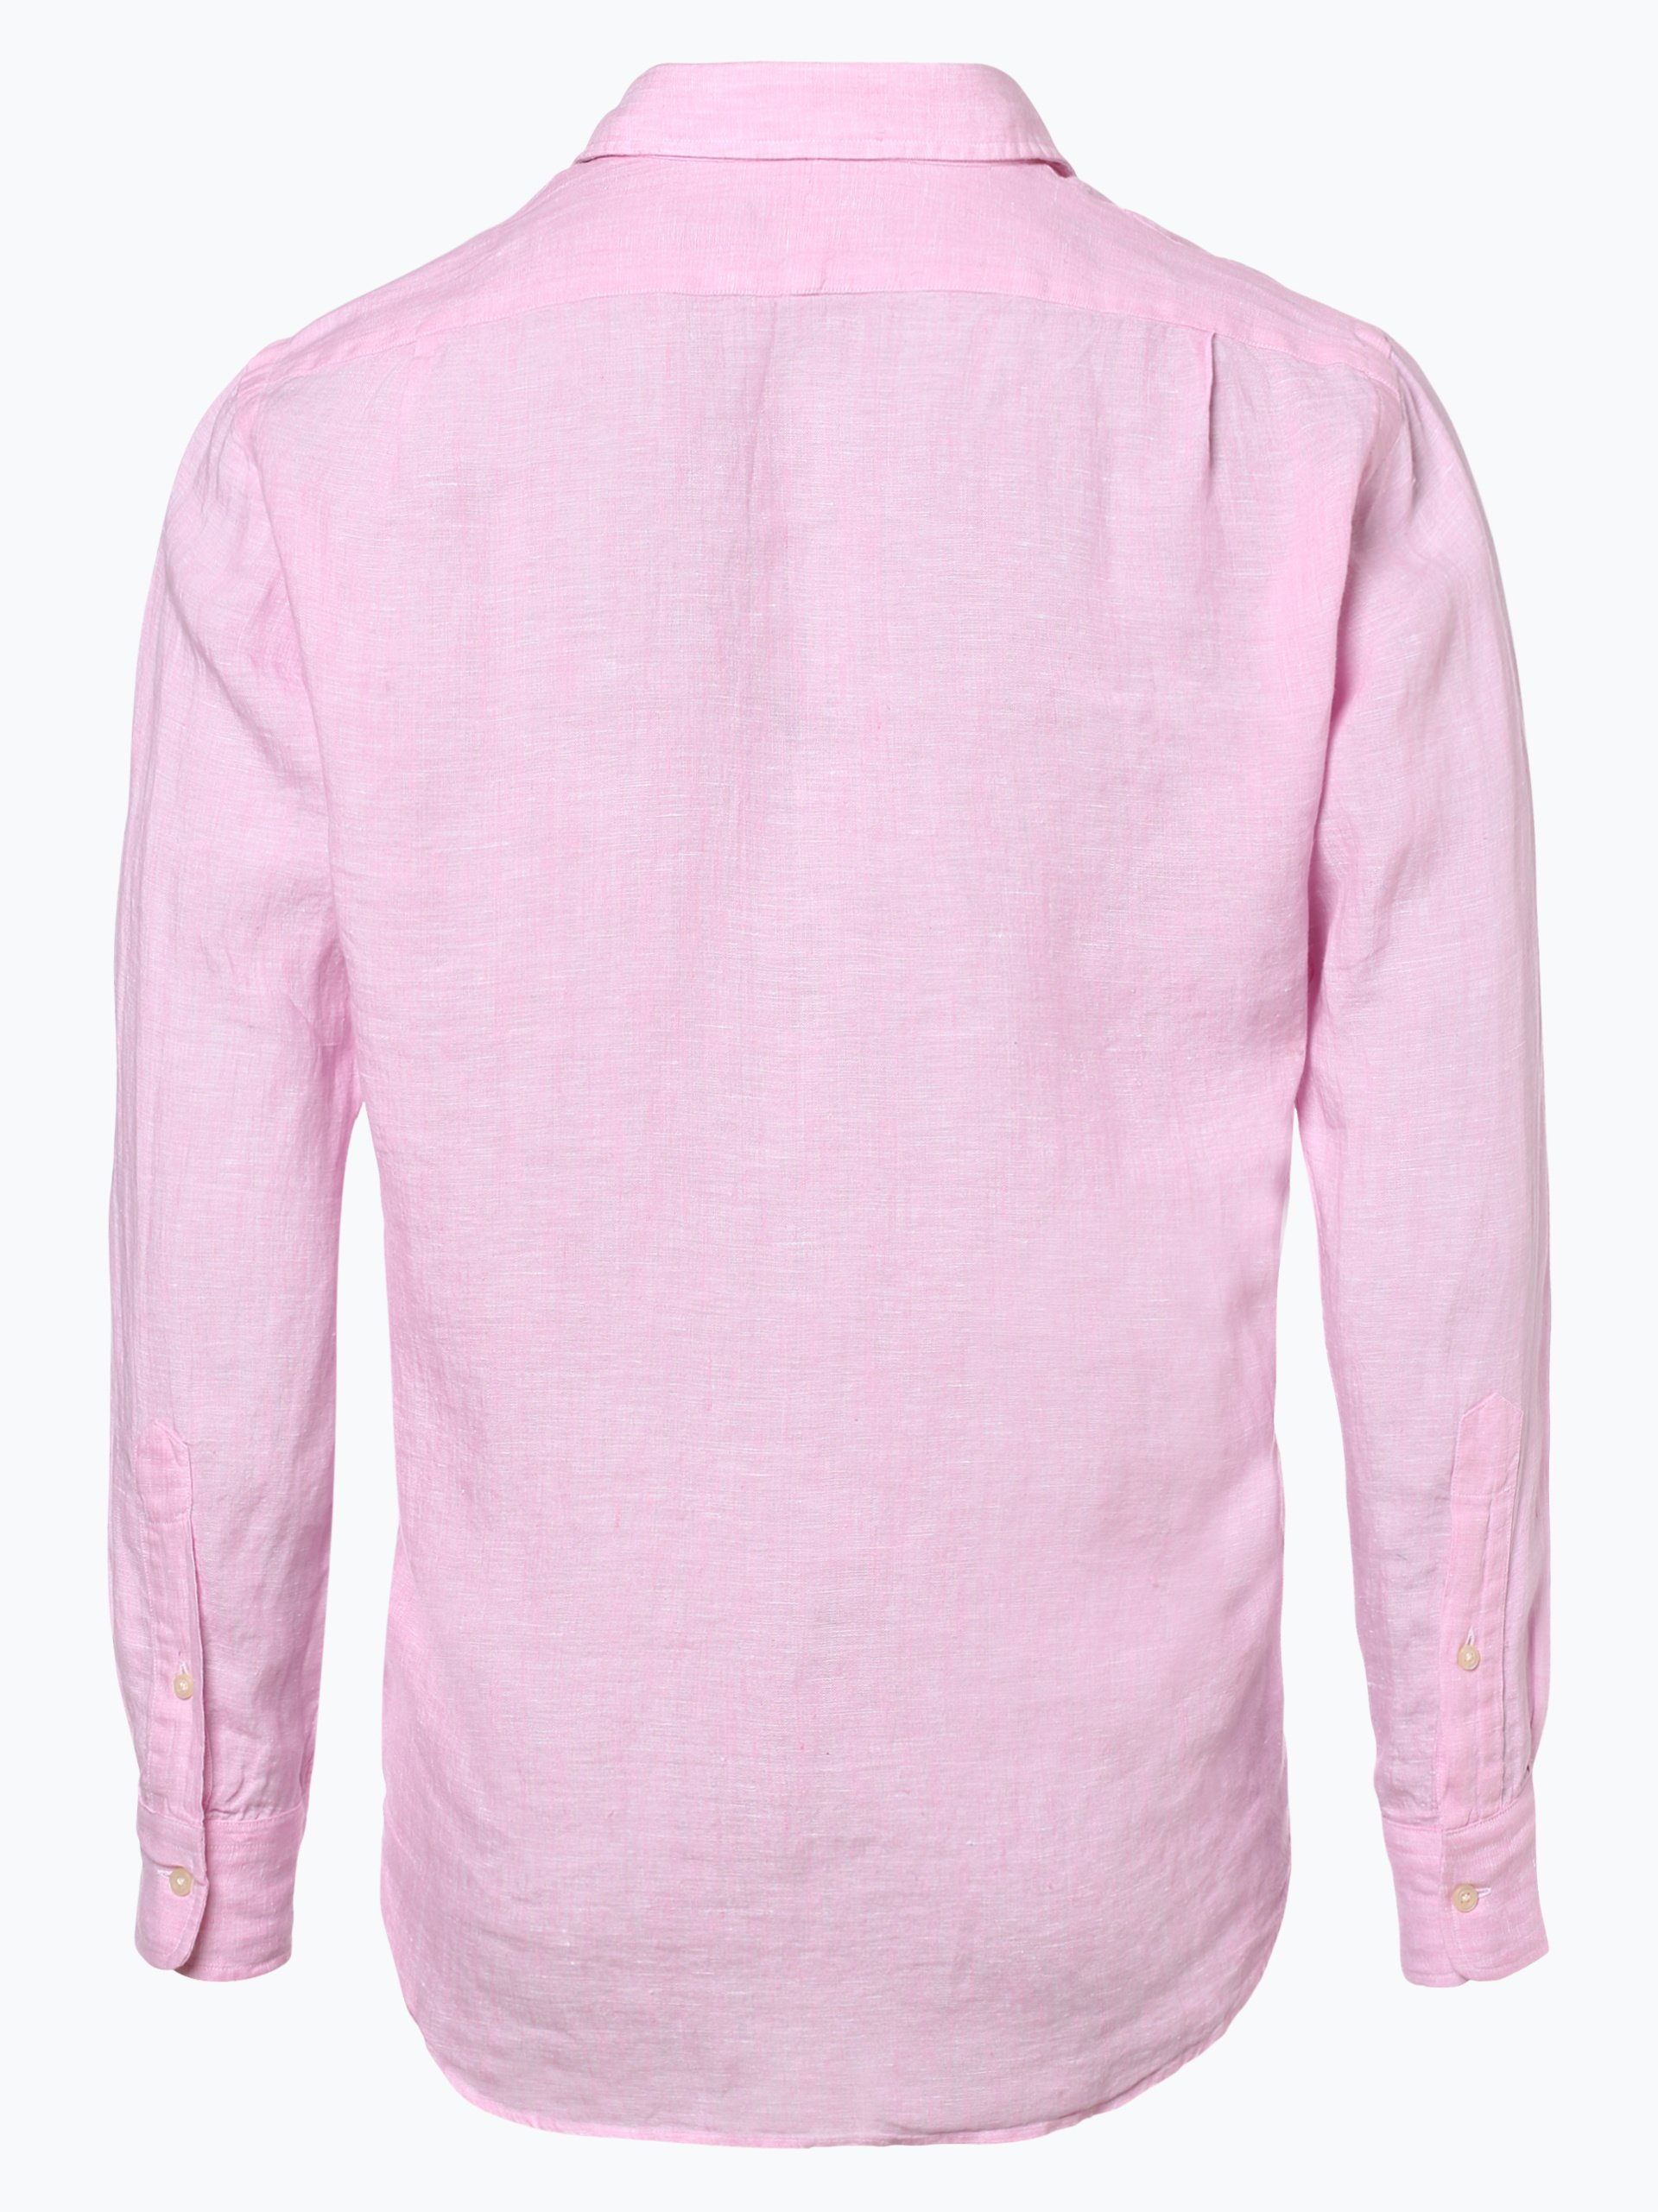 polo ralph lauren herren hemd aus leinen pink uni online. Black Bedroom Furniture Sets. Home Design Ideas